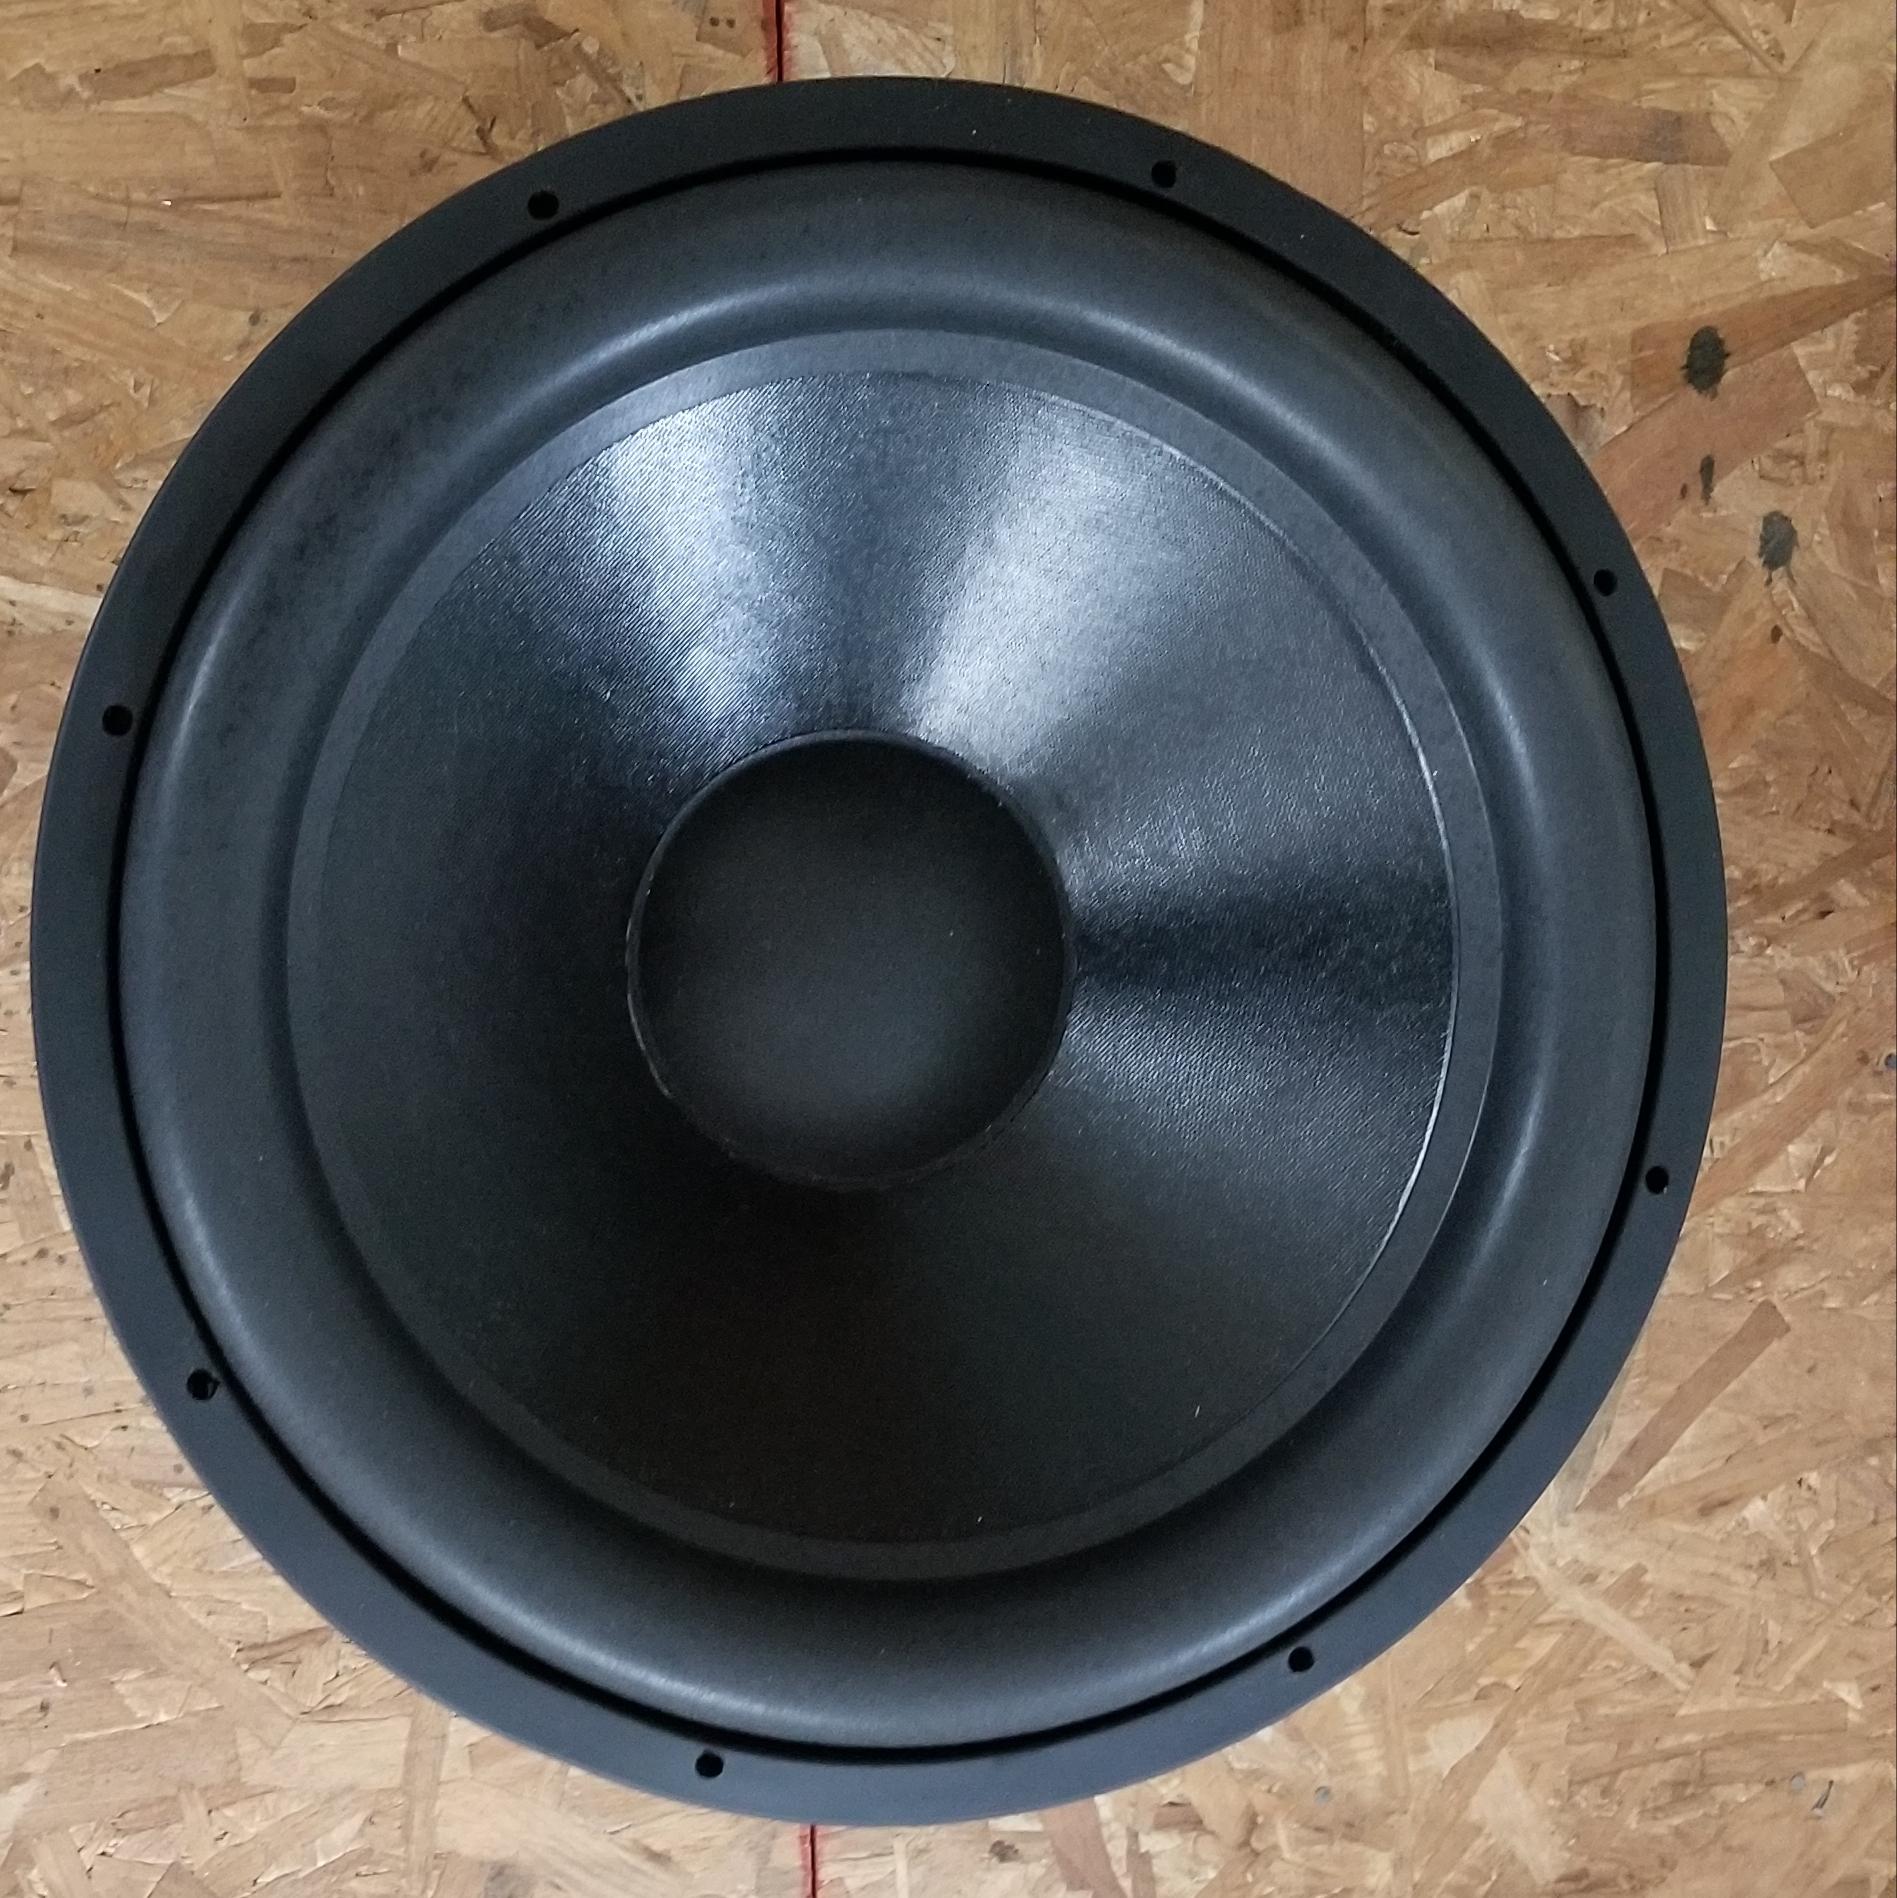 Fi Audio Ib318 infinite baffle subwoofer — Polk Audio